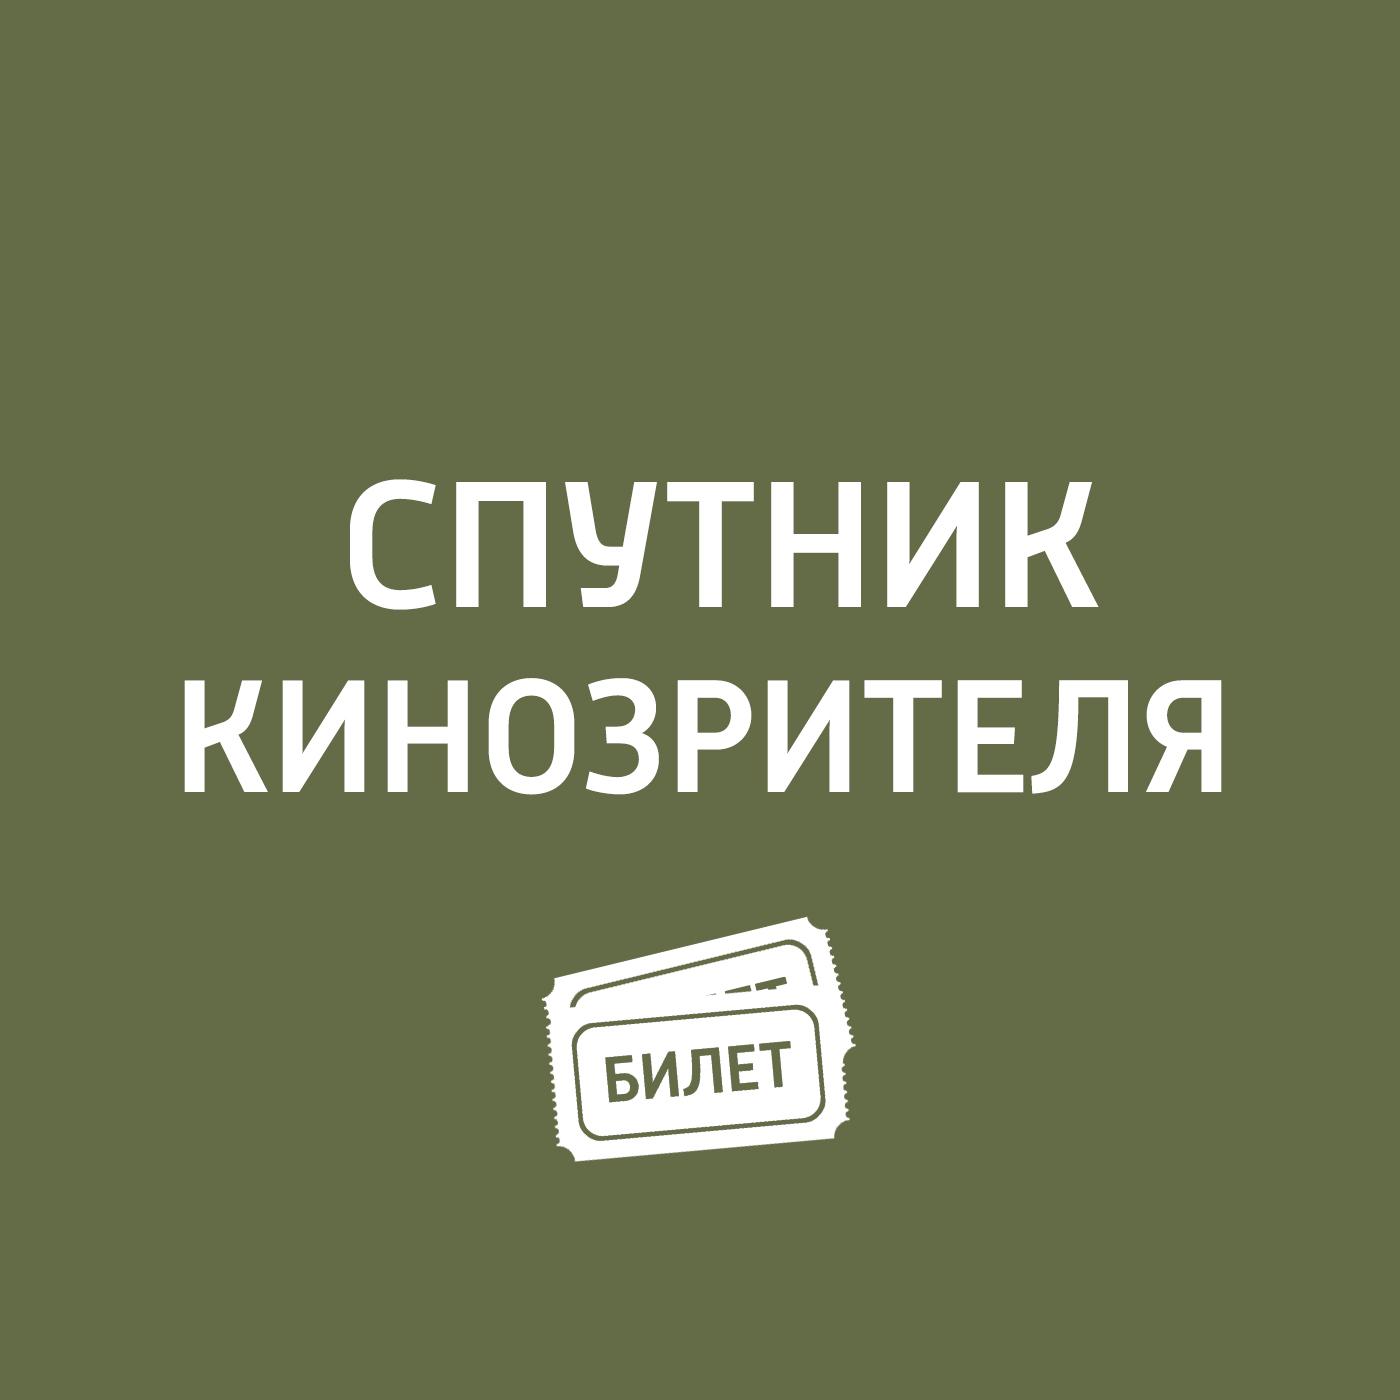 Антон Долин Ушла из жизни сценарист Светлана Кармалита антон долин трудно быть богом нимфоманка 2 дубровский